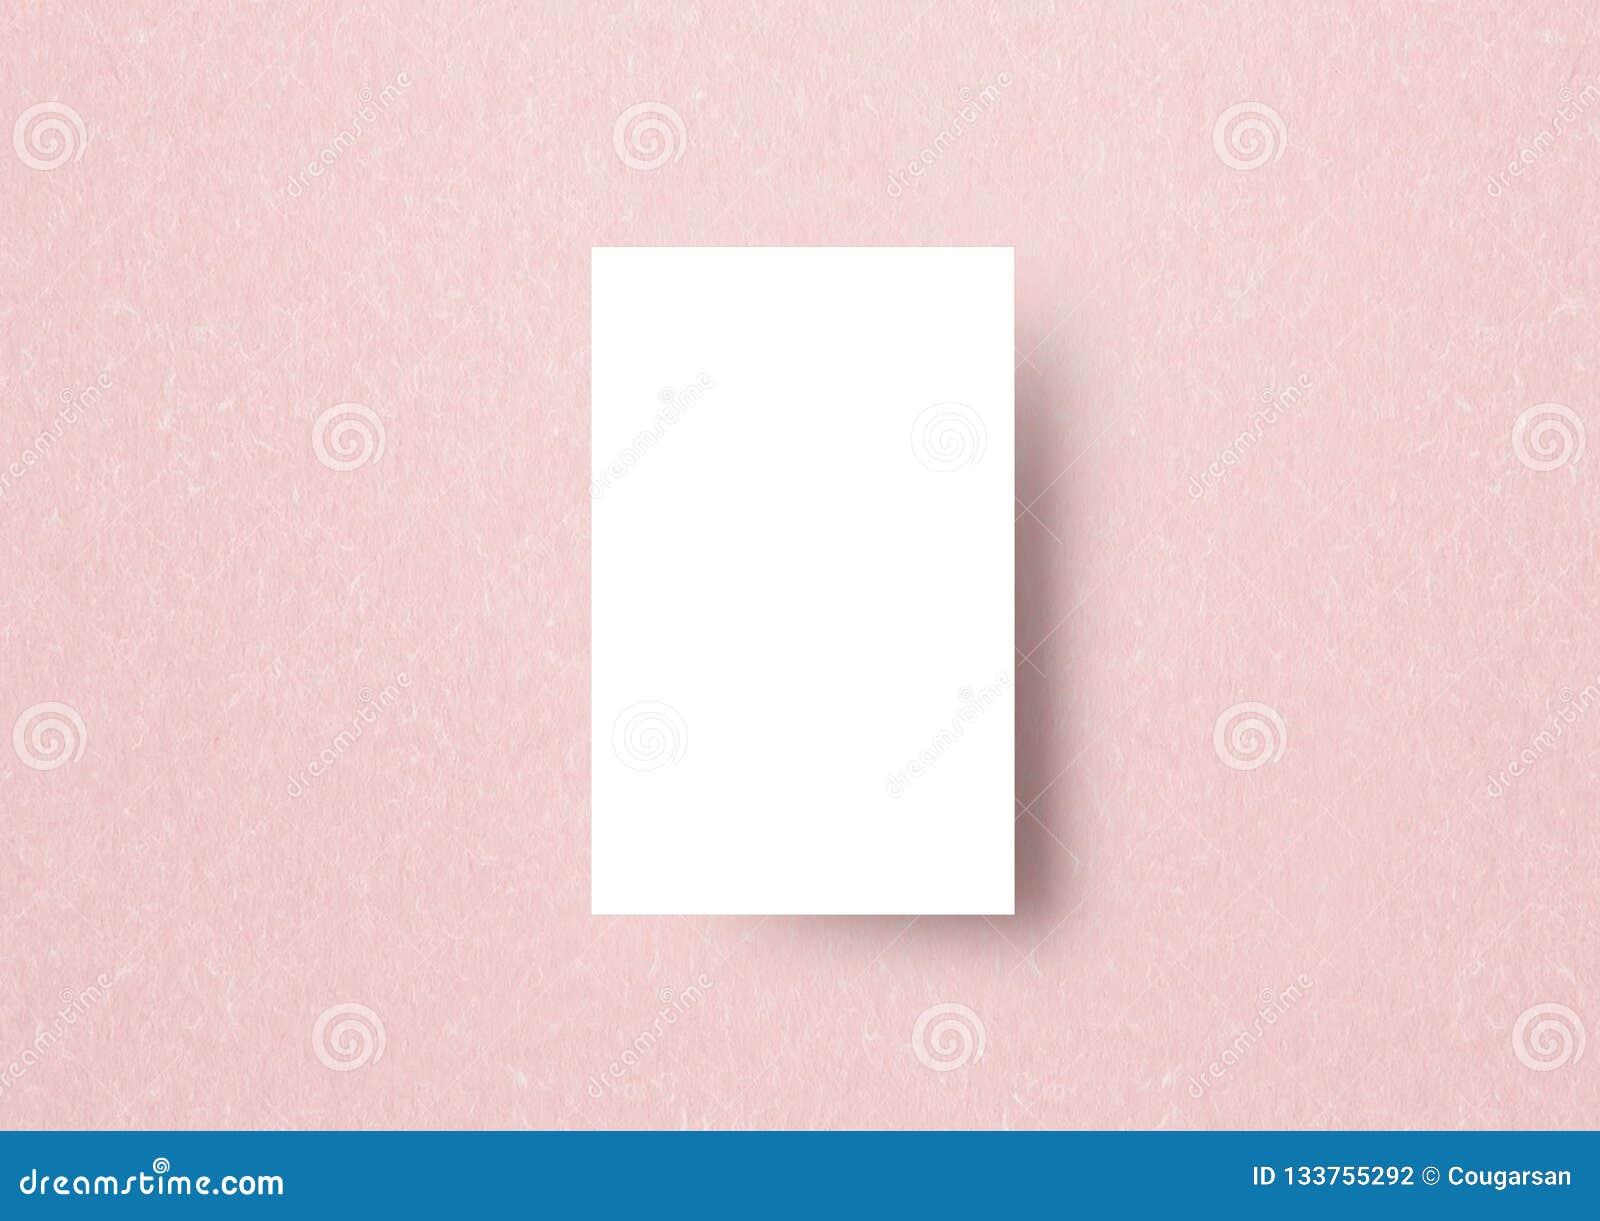 Backbround японской бумаги paastel шаблона модель-макета Naemcard розовое